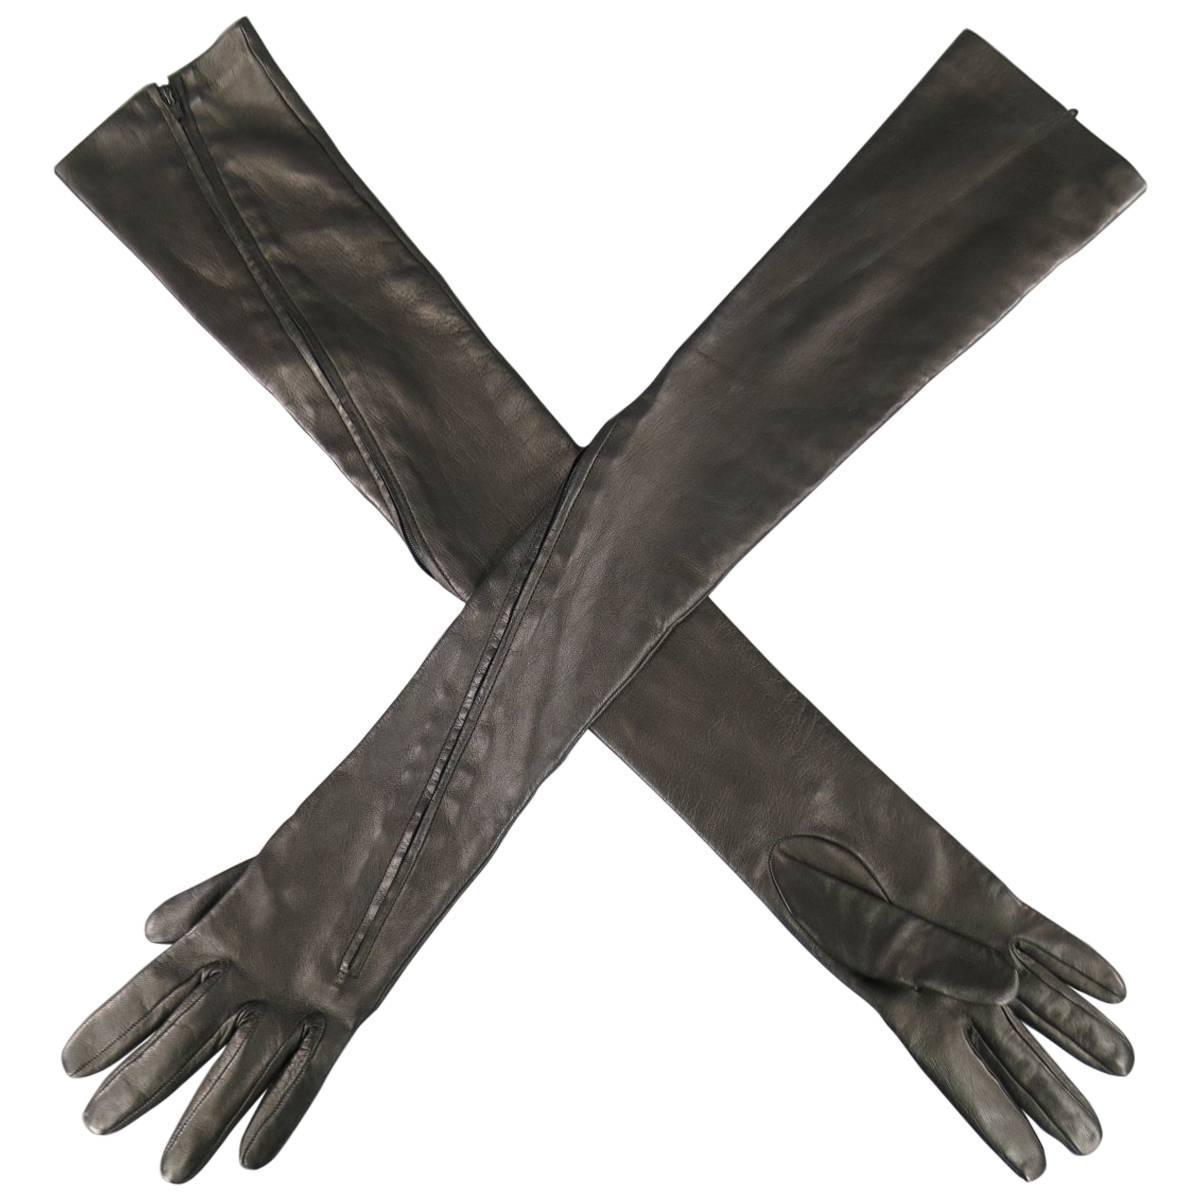 Vintage ladies leather opera gloves - Yohji Yamamoto Black Leather Zip Up Elbow Length Opera Gloves